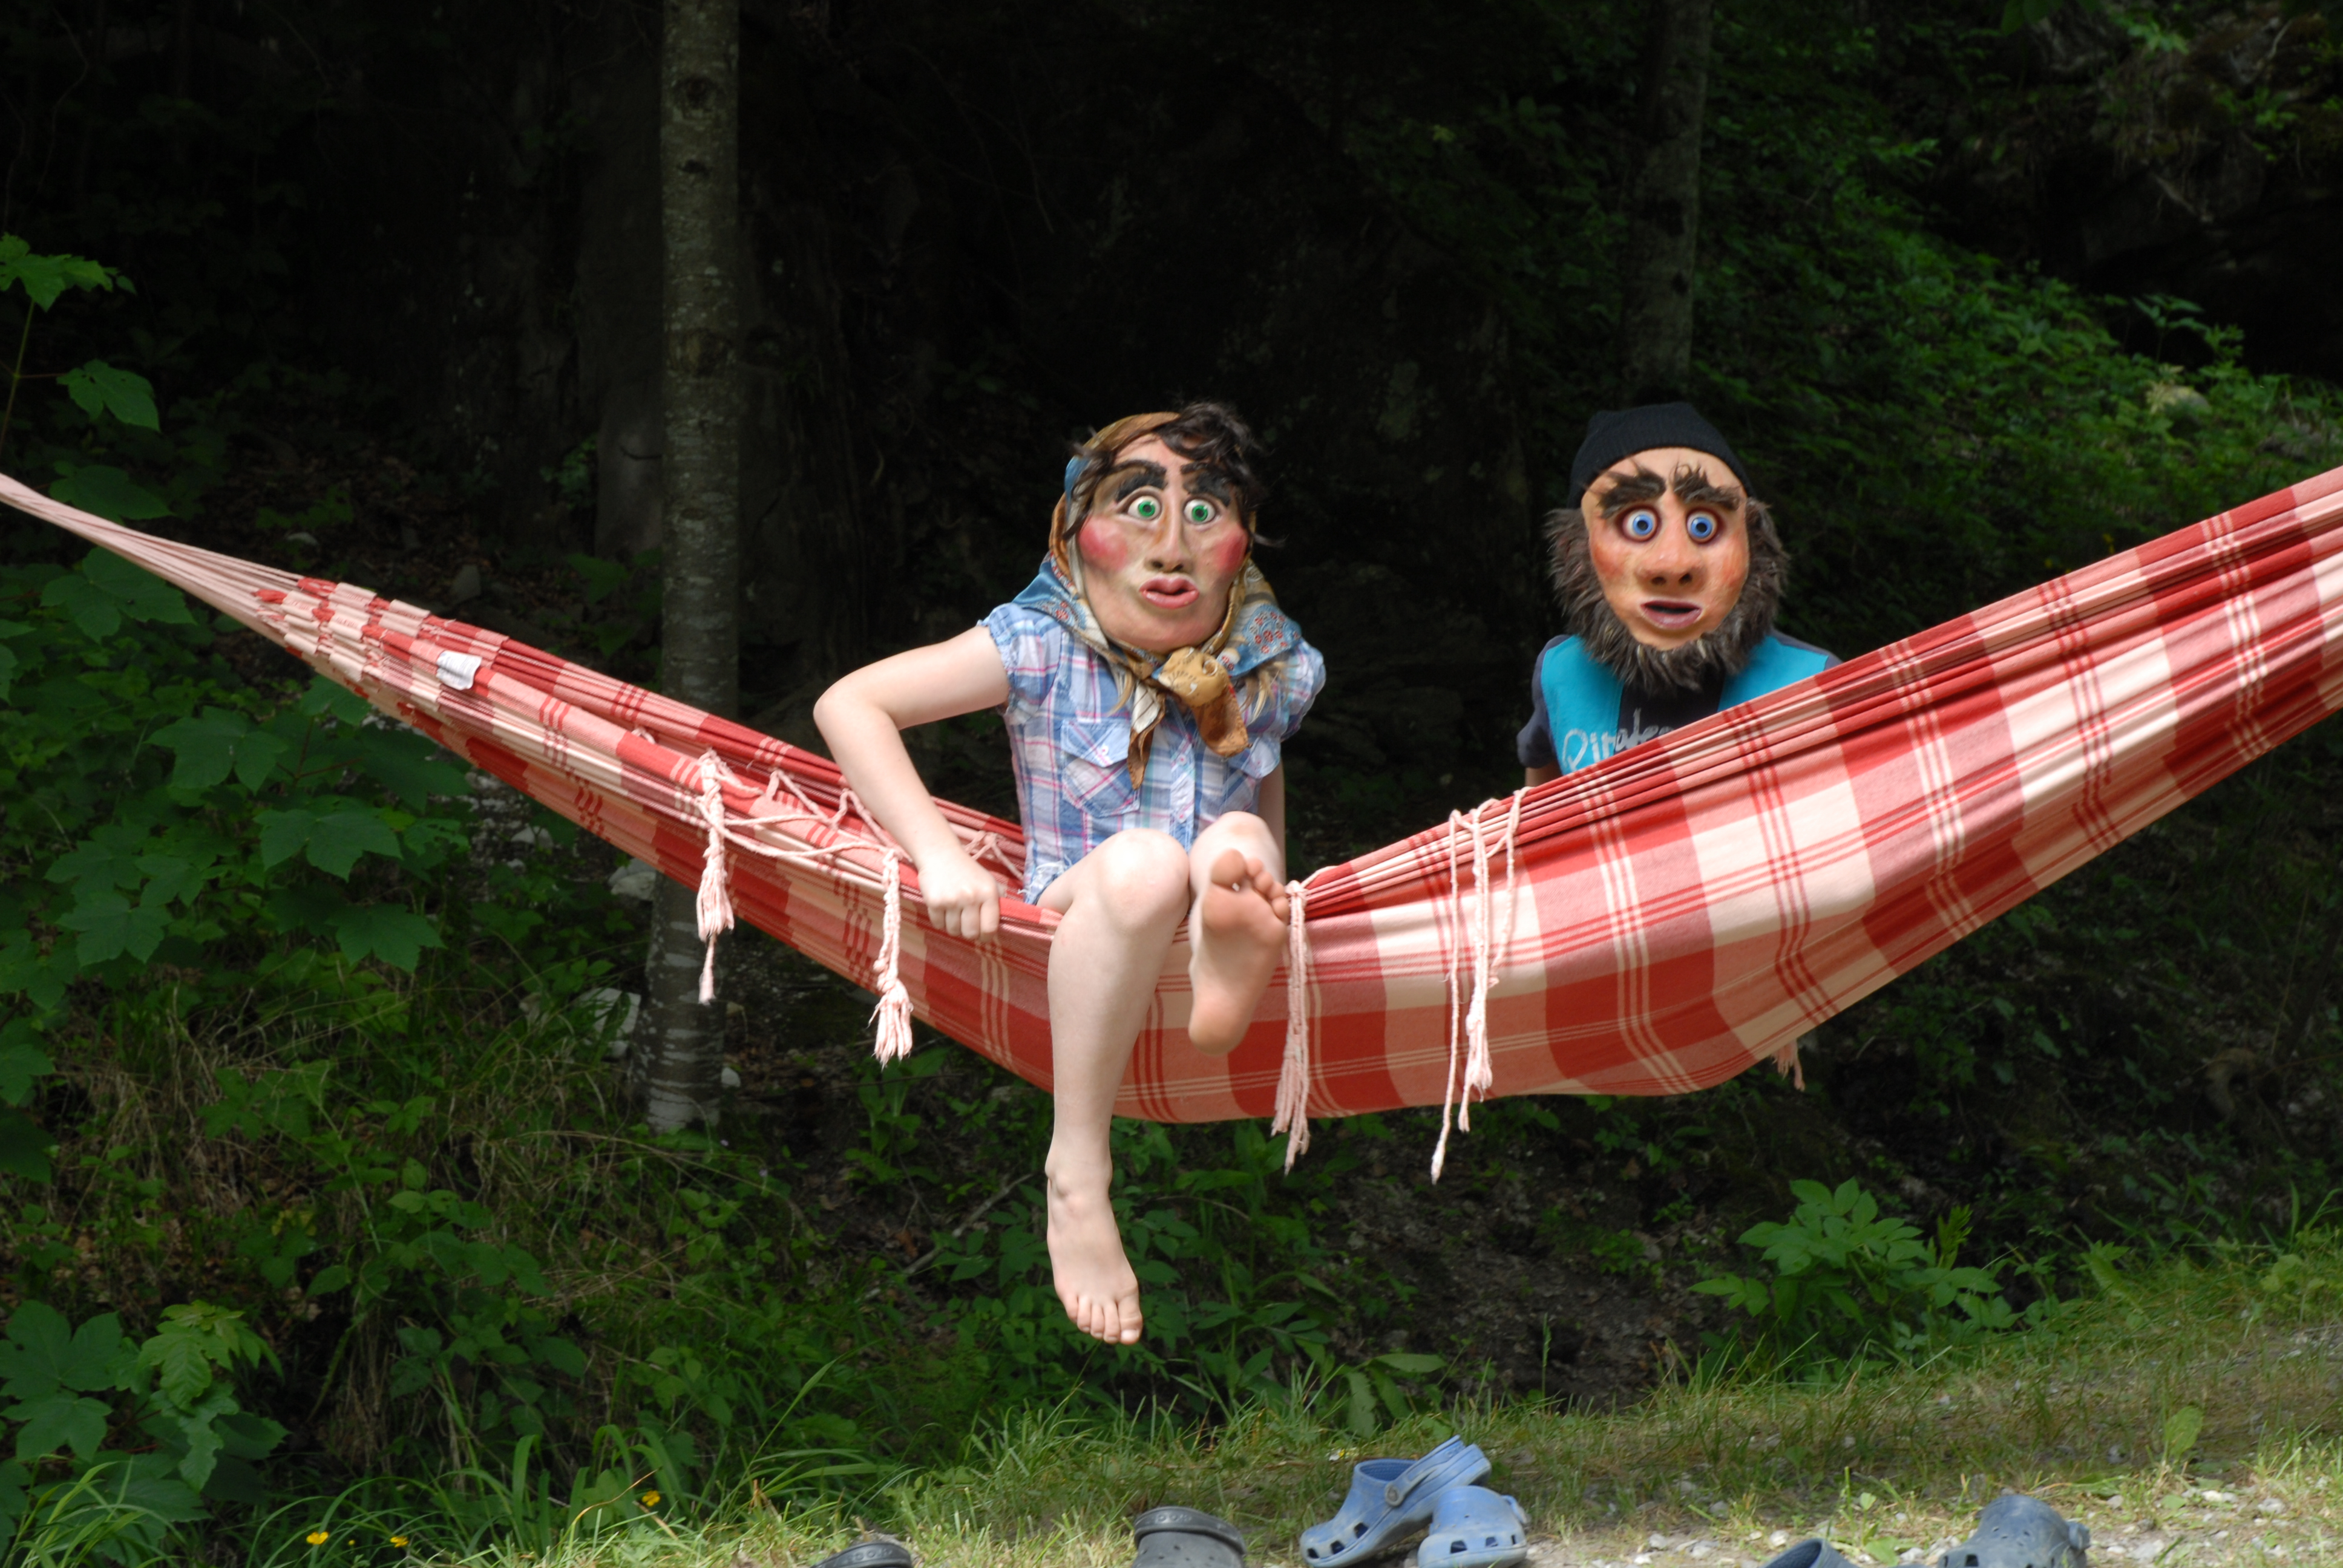 Kids Hangin'